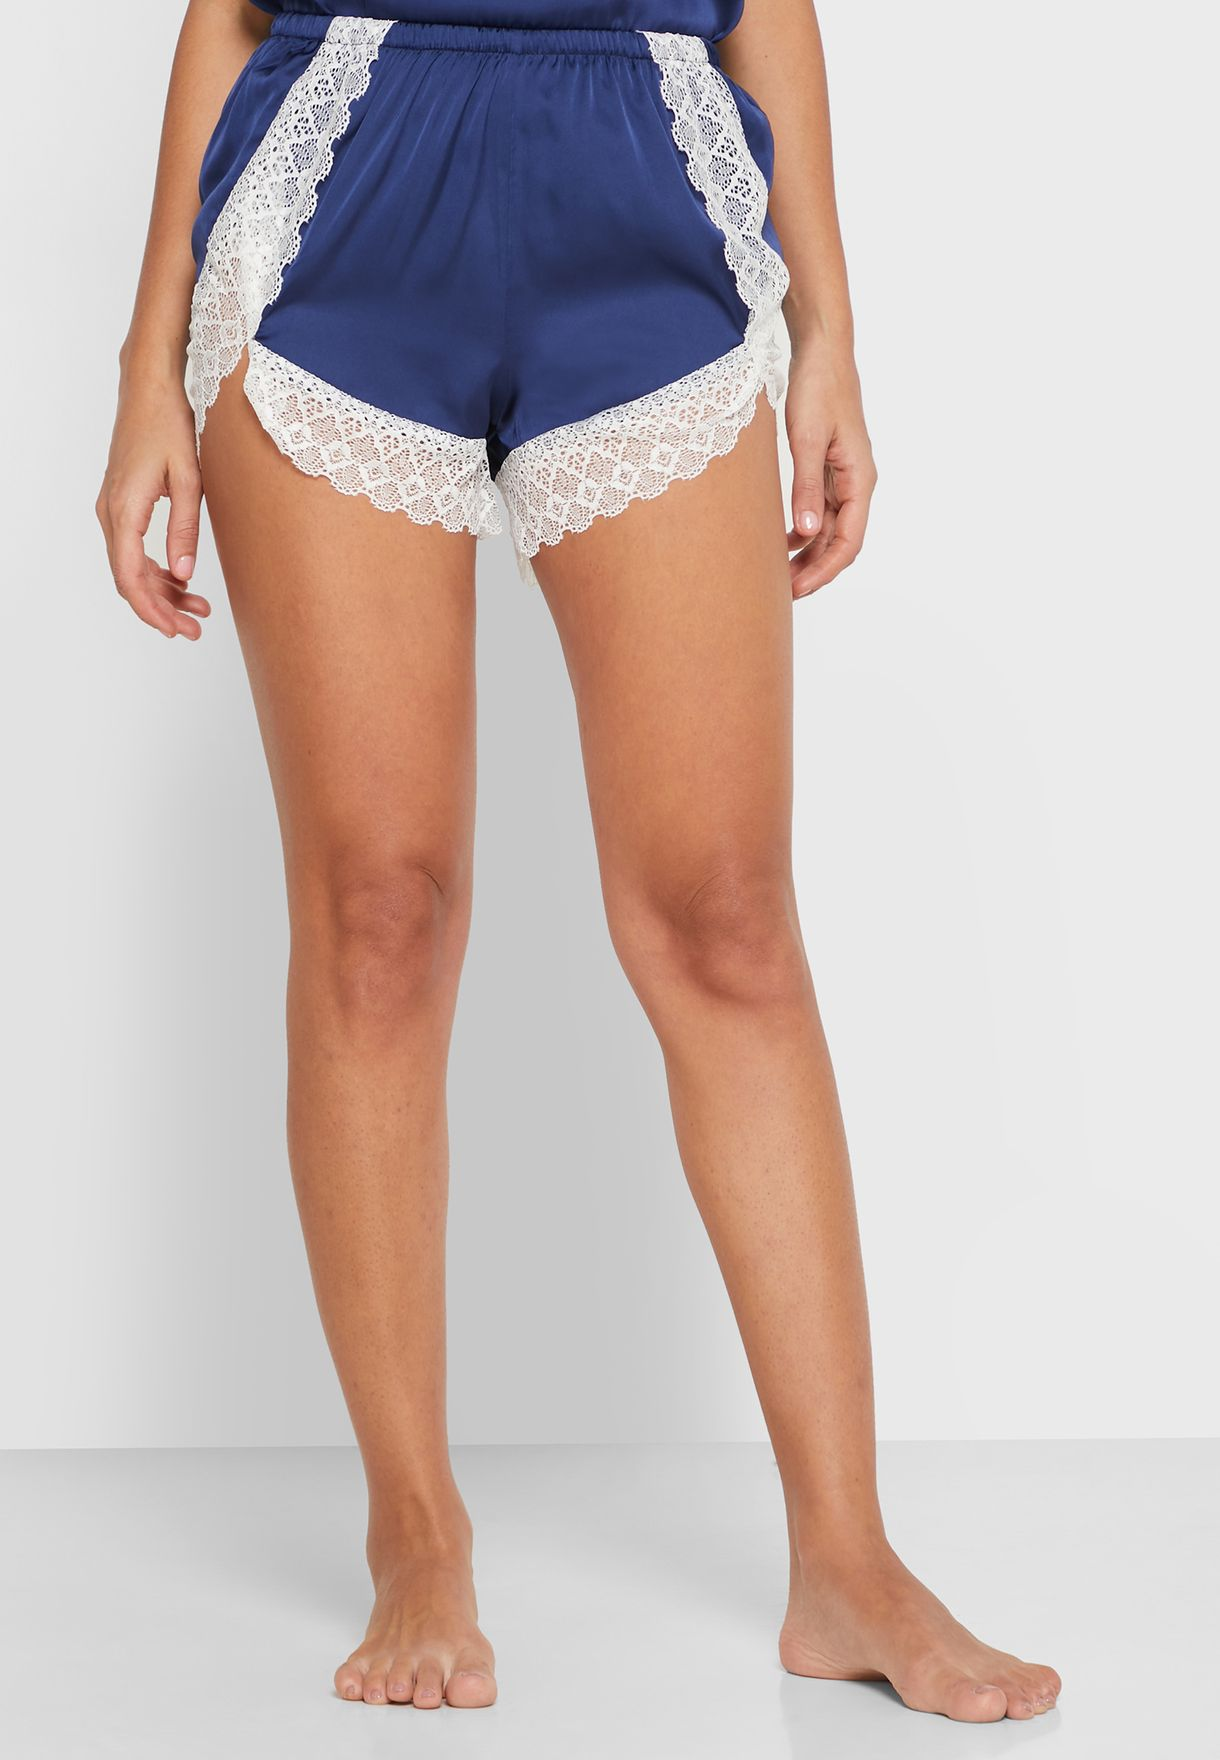 4 Pcs Lace Trim Nightwear Set